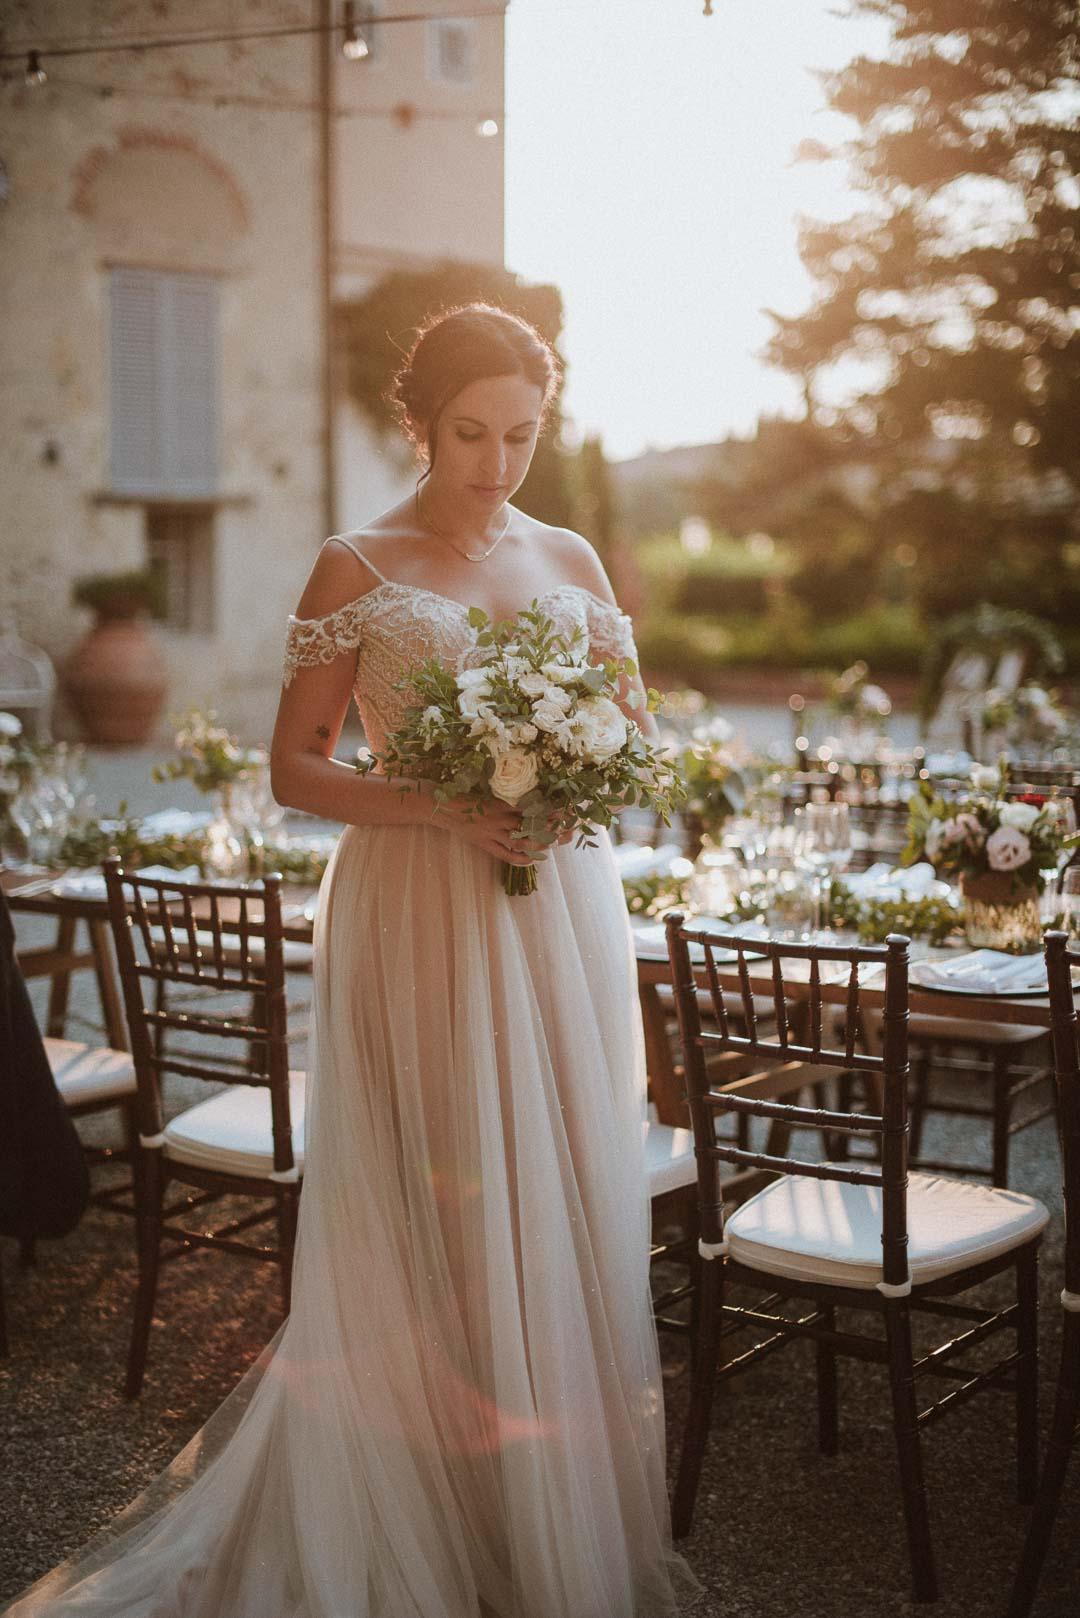 wedding-photographer-destination-fineart-bespoke-reportage-tuscany-villascorzi-vivianeizzo-spazio46-128